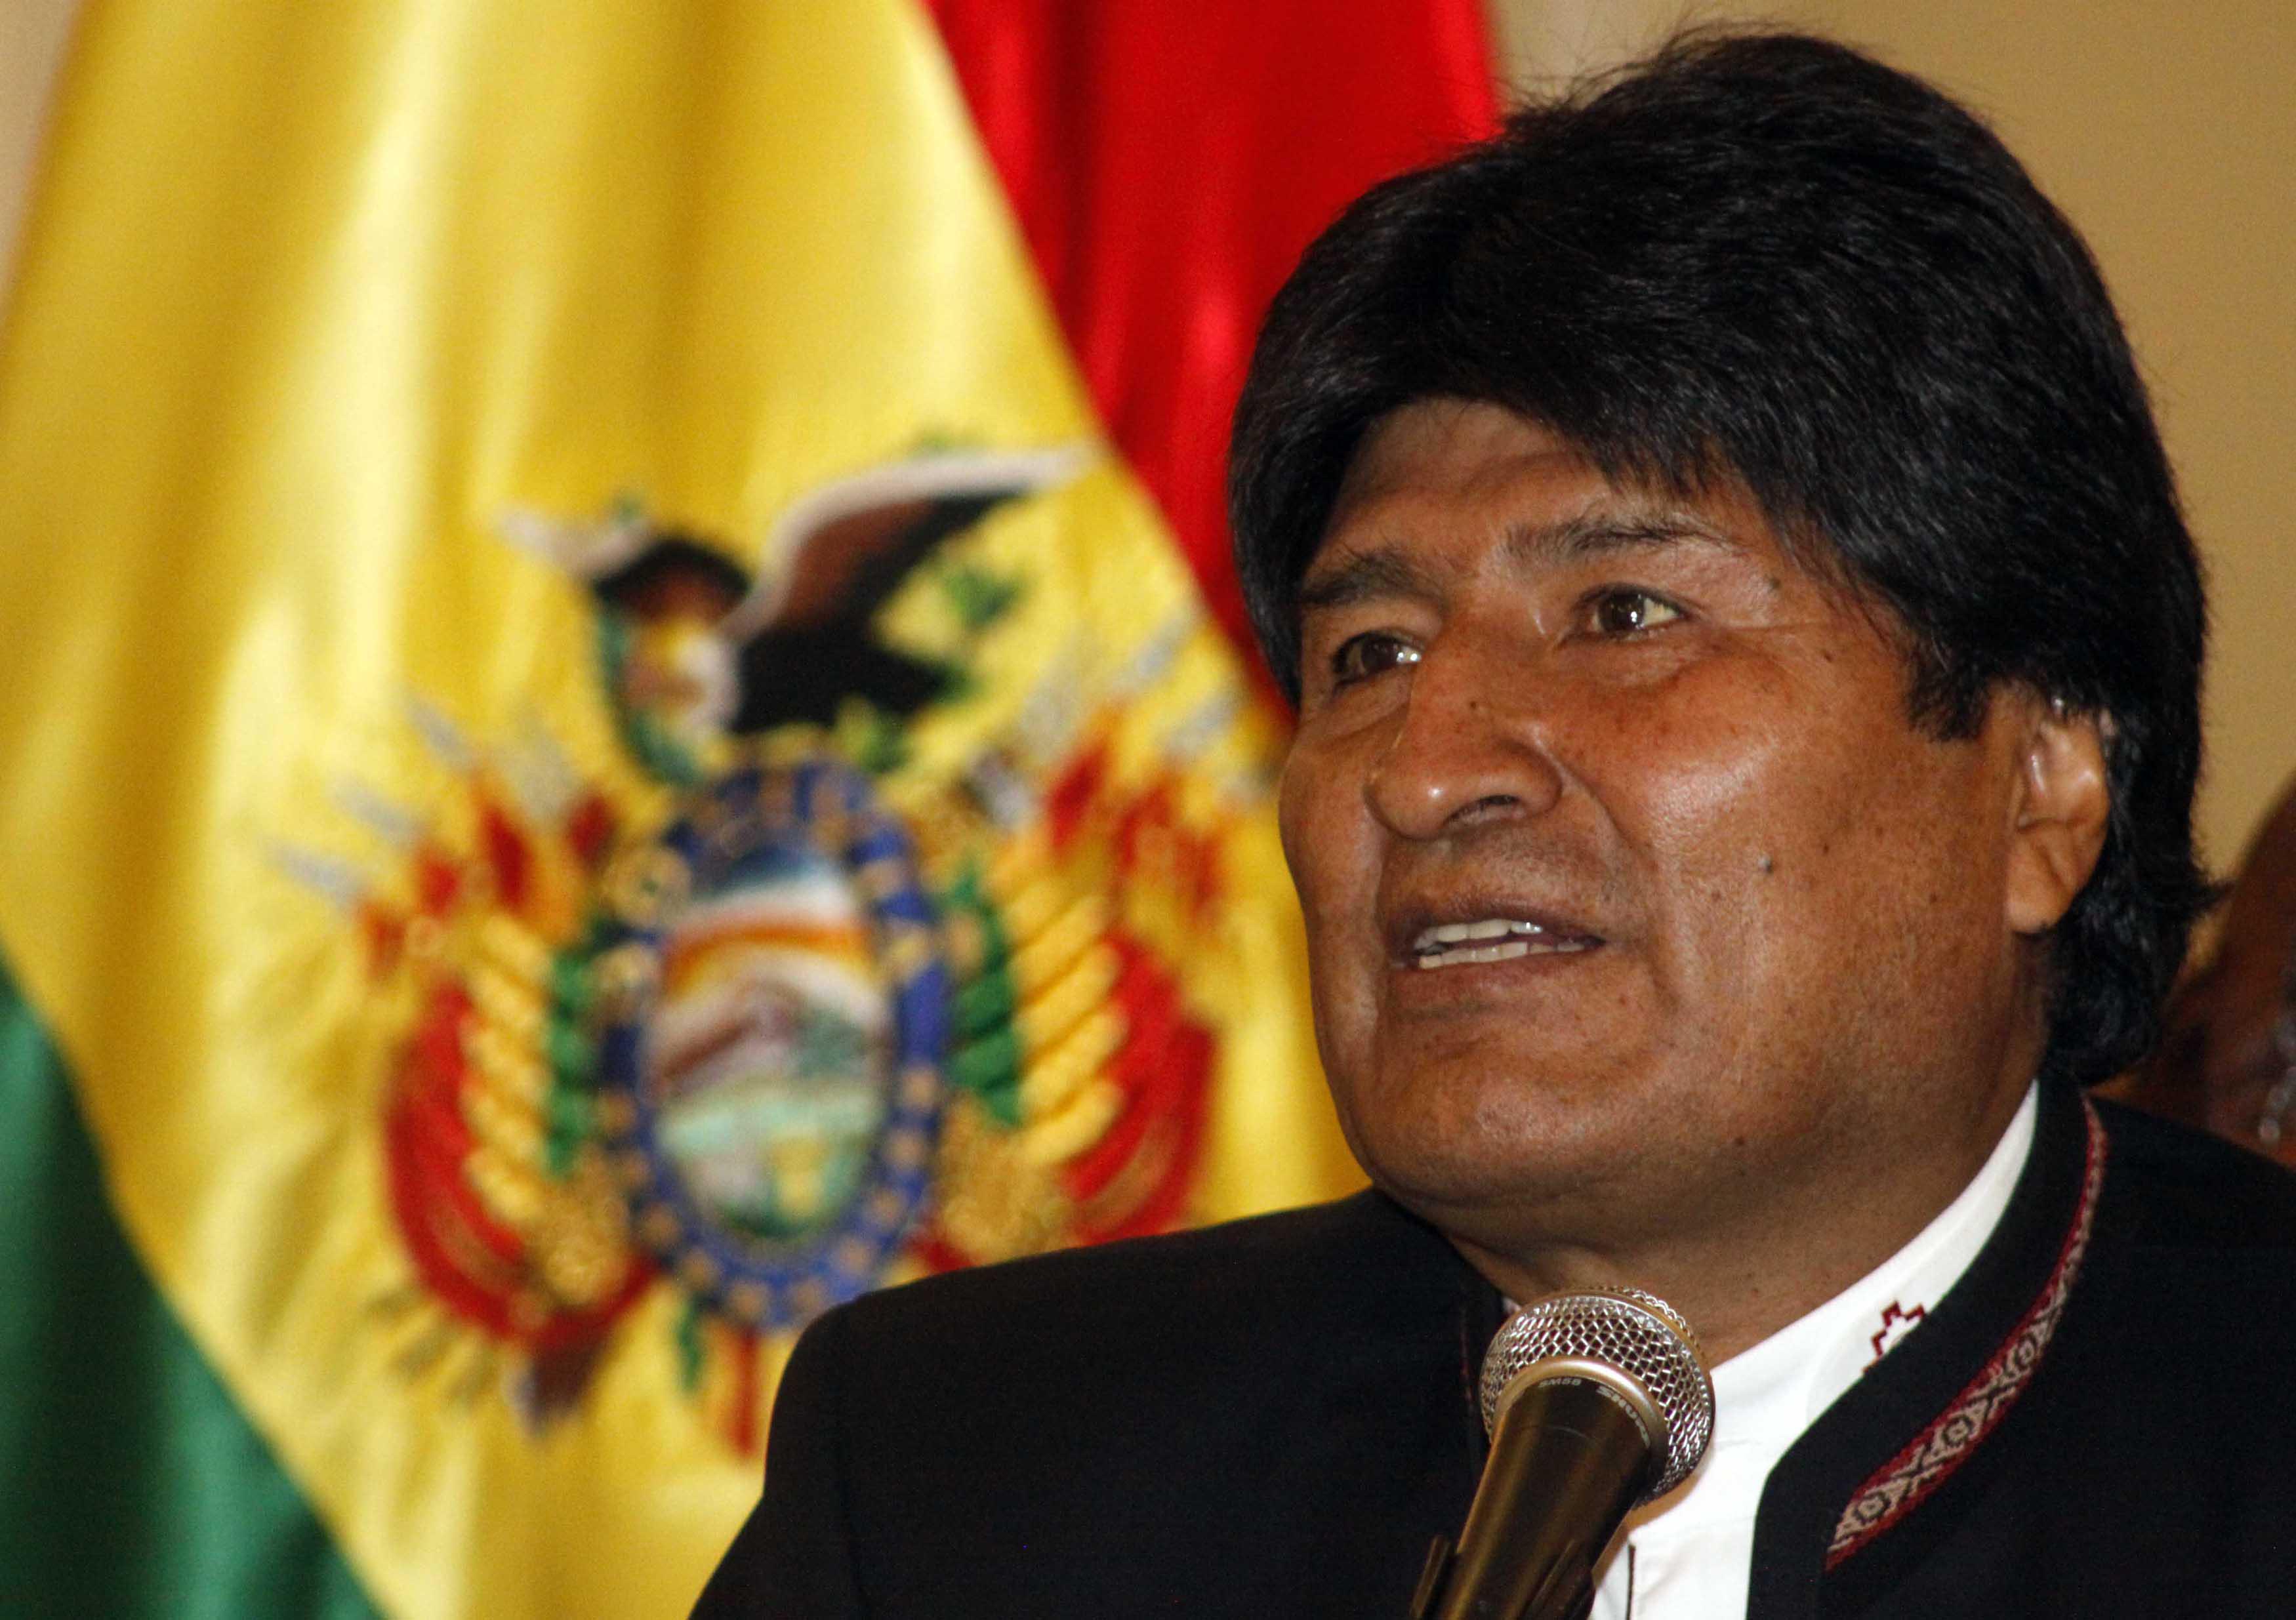 Bolivia, l'opposizione: c'è un ordine di cattura per Morales